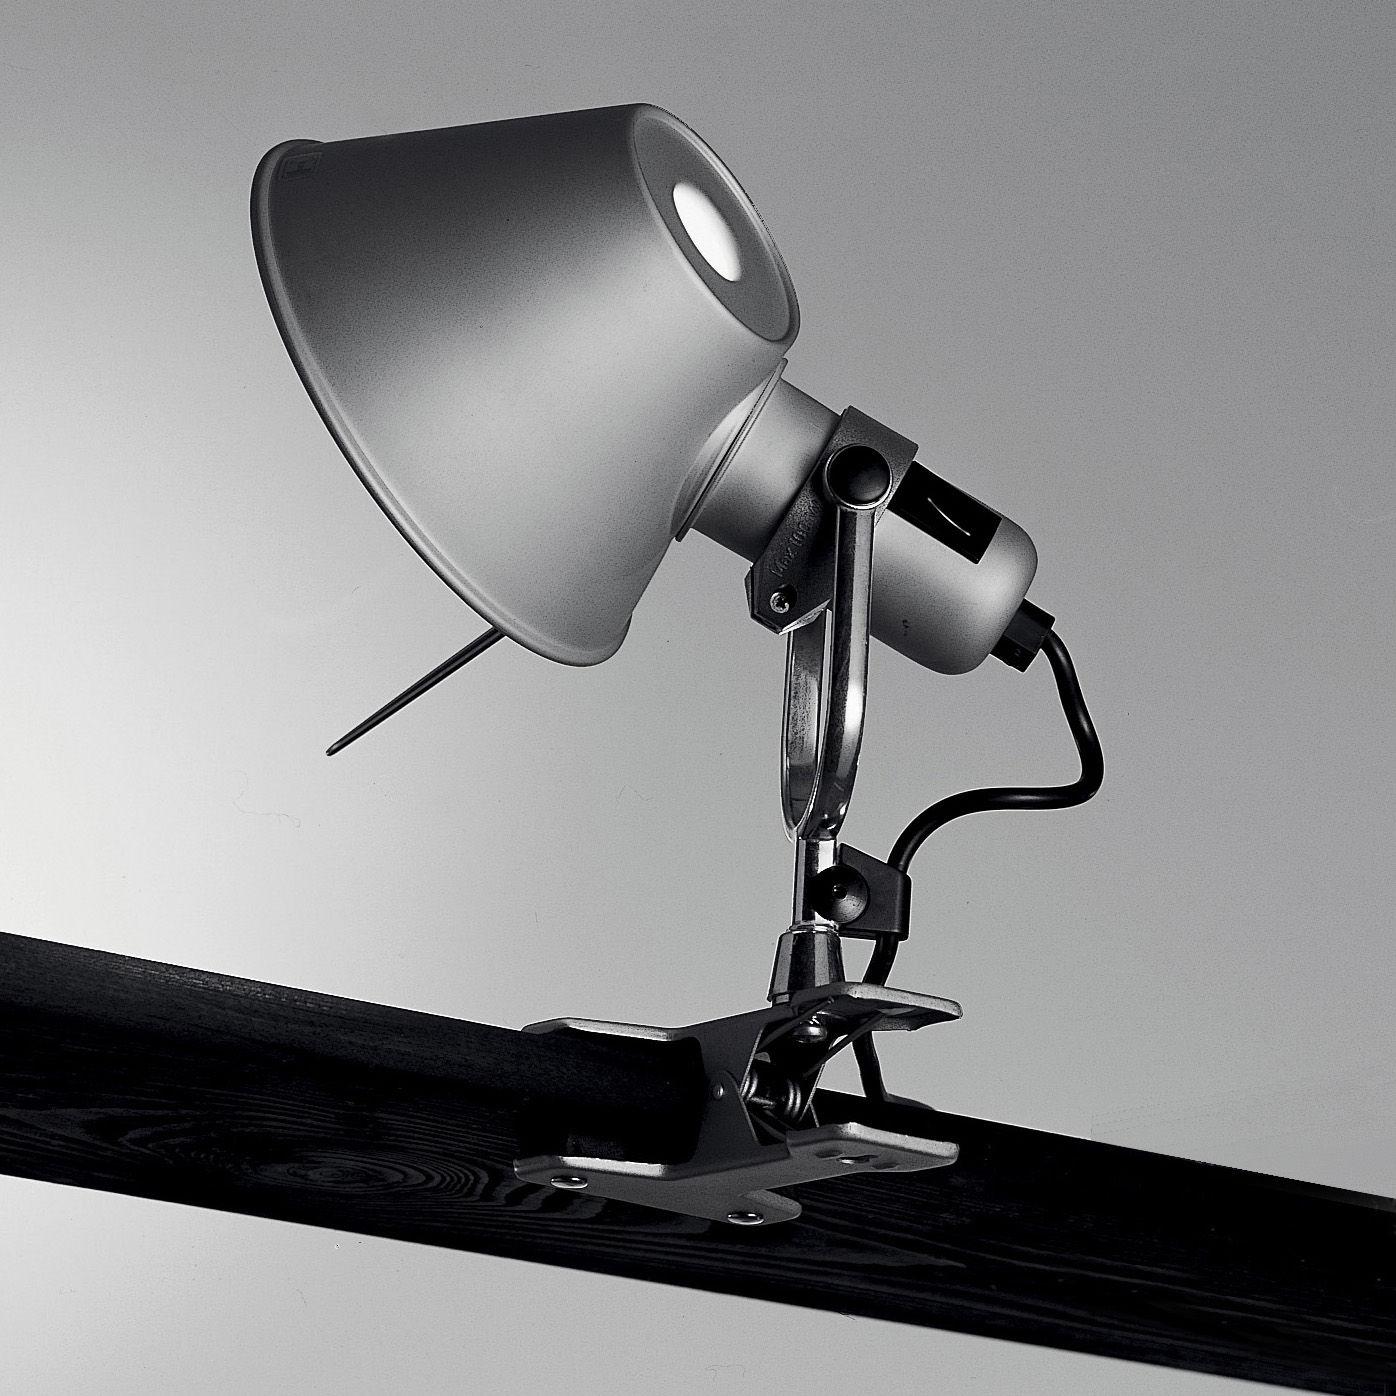 Leuchten - Wandleuchten - Tolomeo Pinza LED Klemmleuchte LED - Artemide - H 23 cm -  Aluminium - Aluminium, Stahl